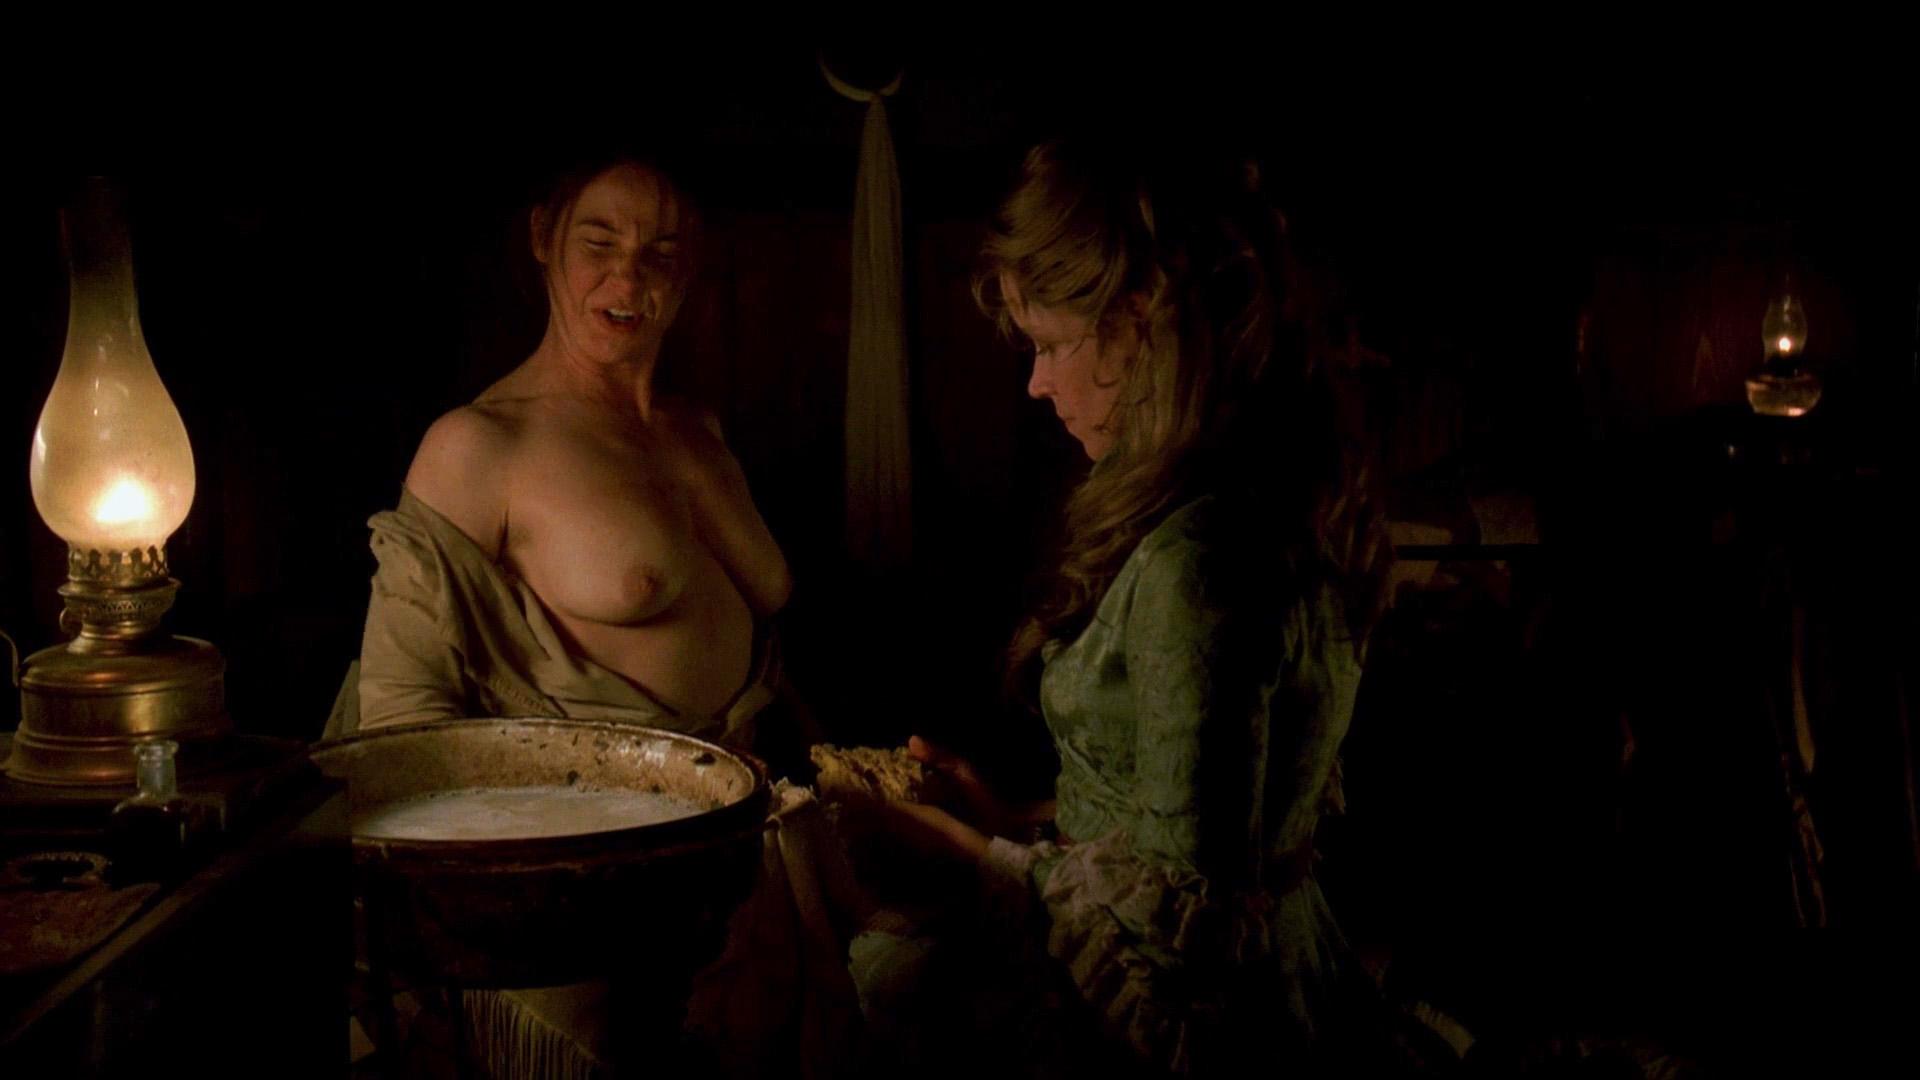 Hot girls nude